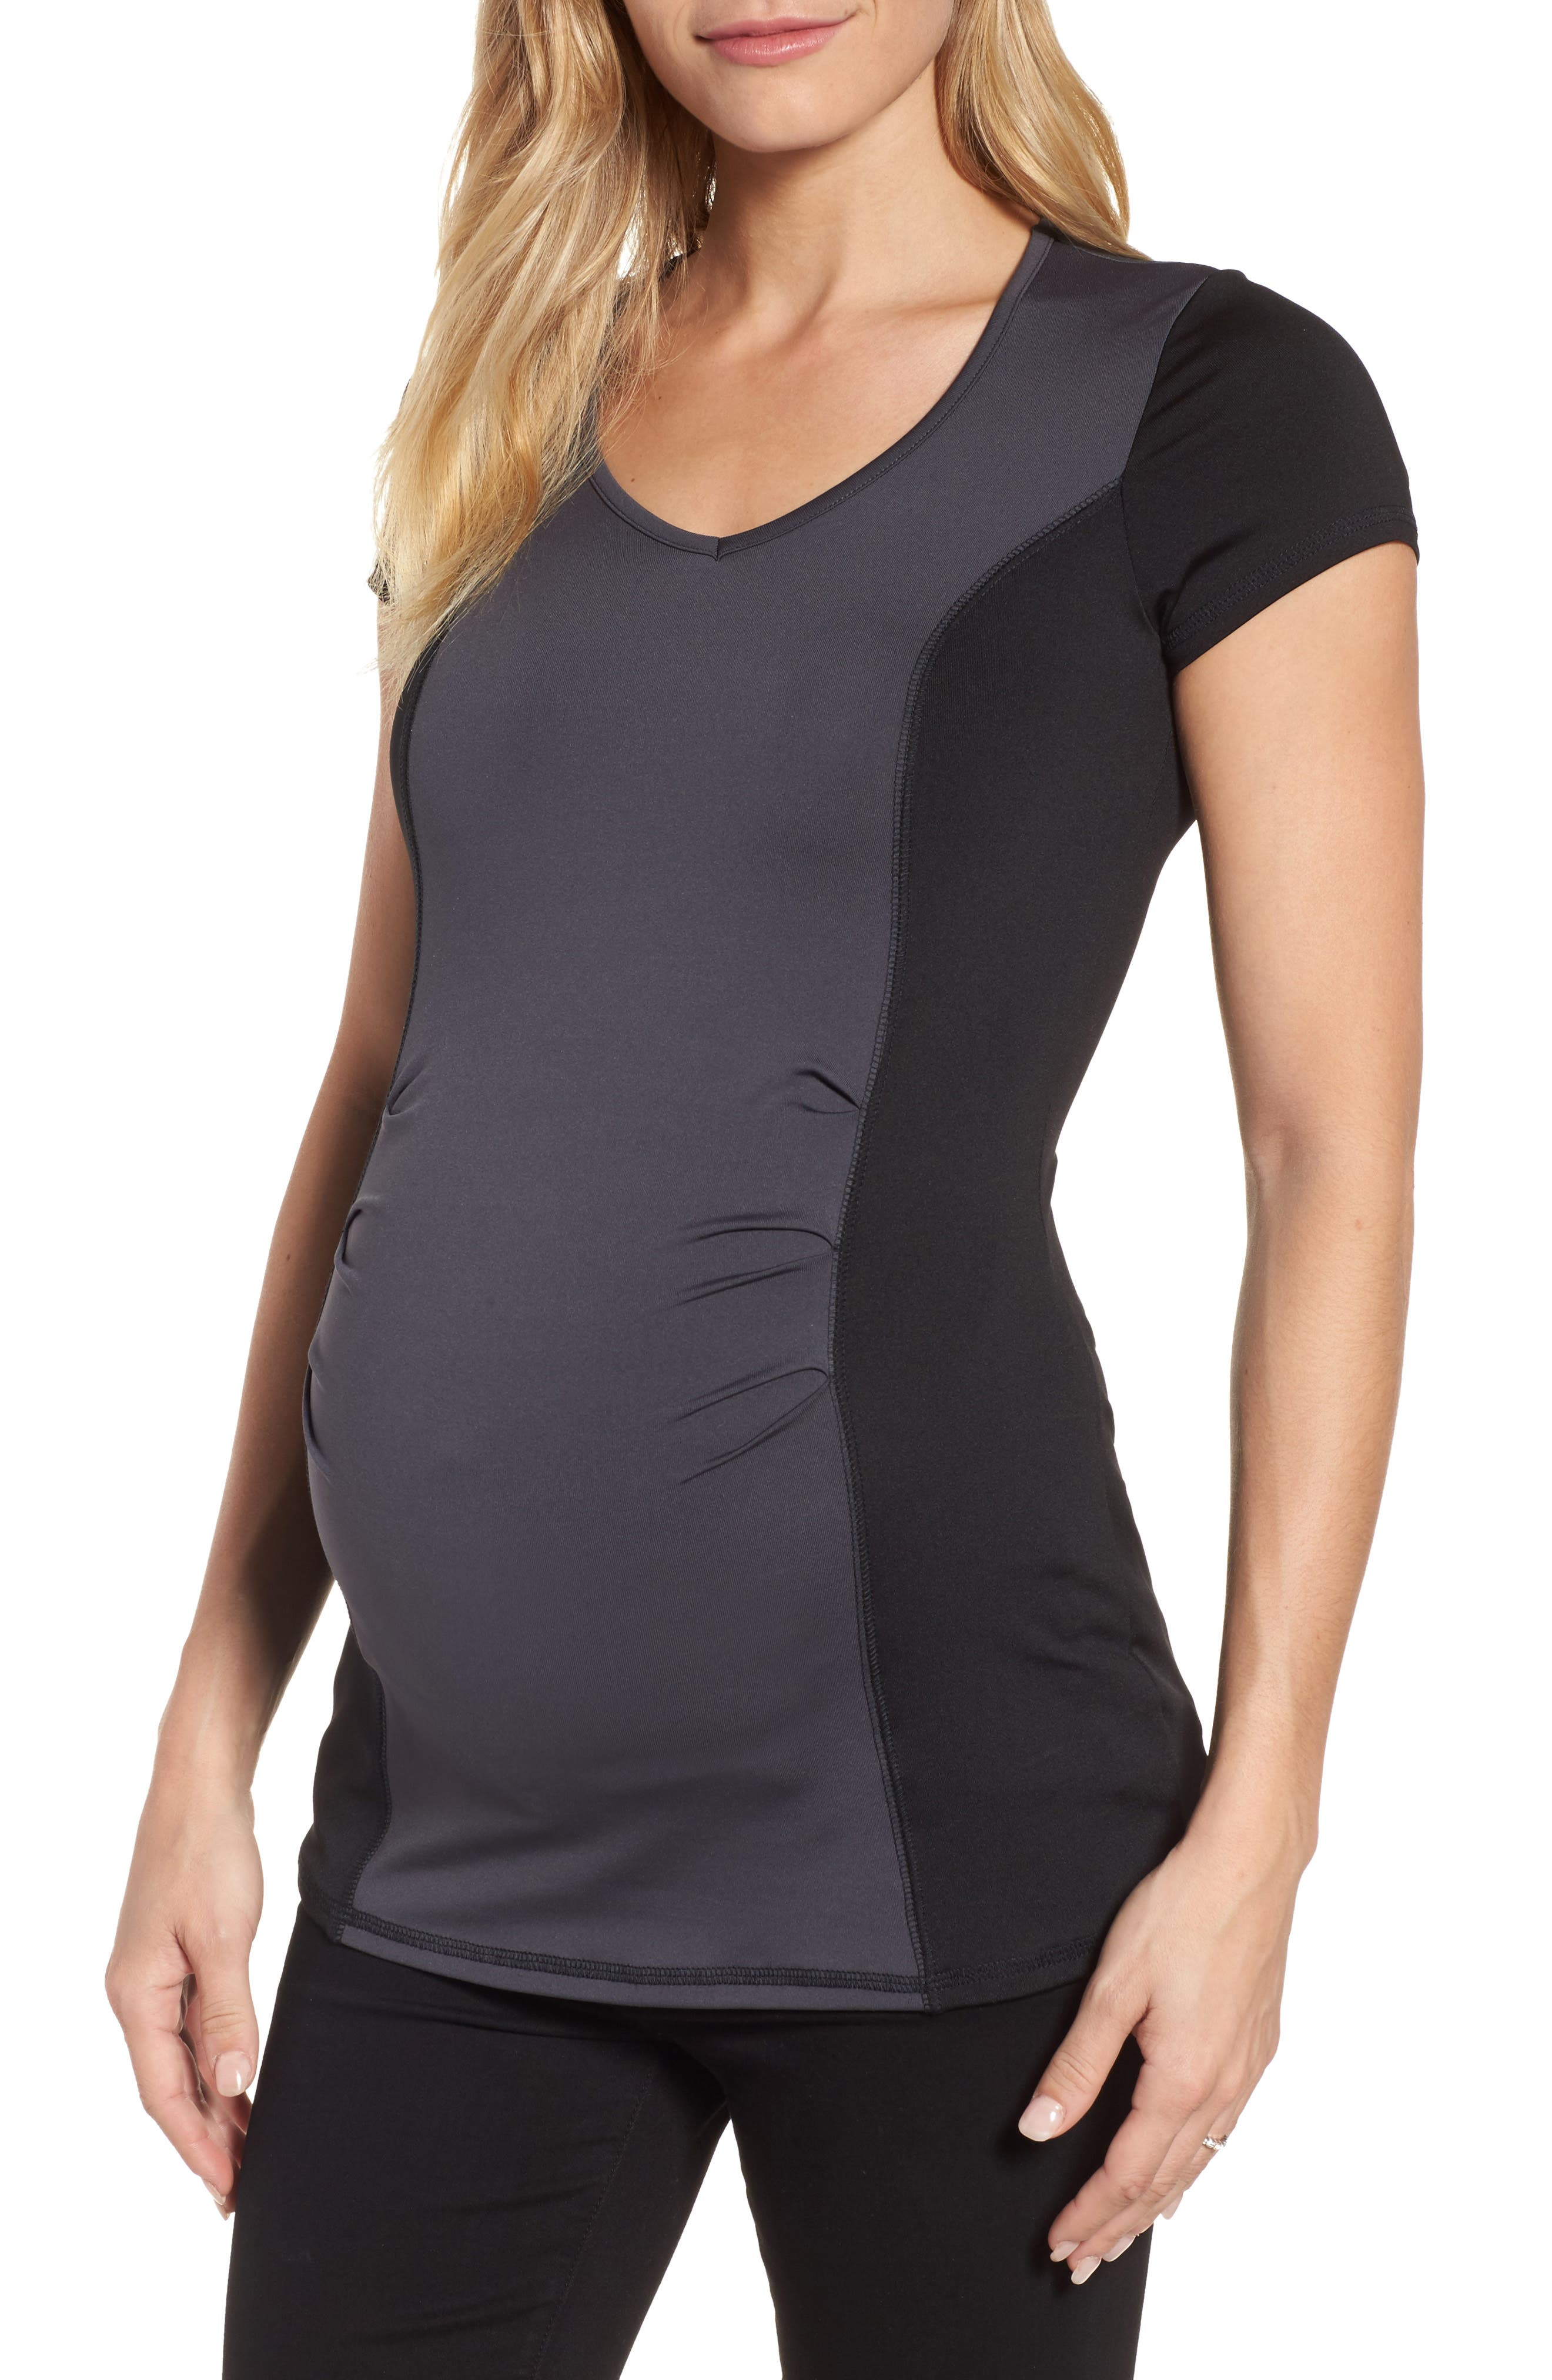 Colorblock Maternity Top,                             Main thumbnail 1, color,                             Charcoal/ Black